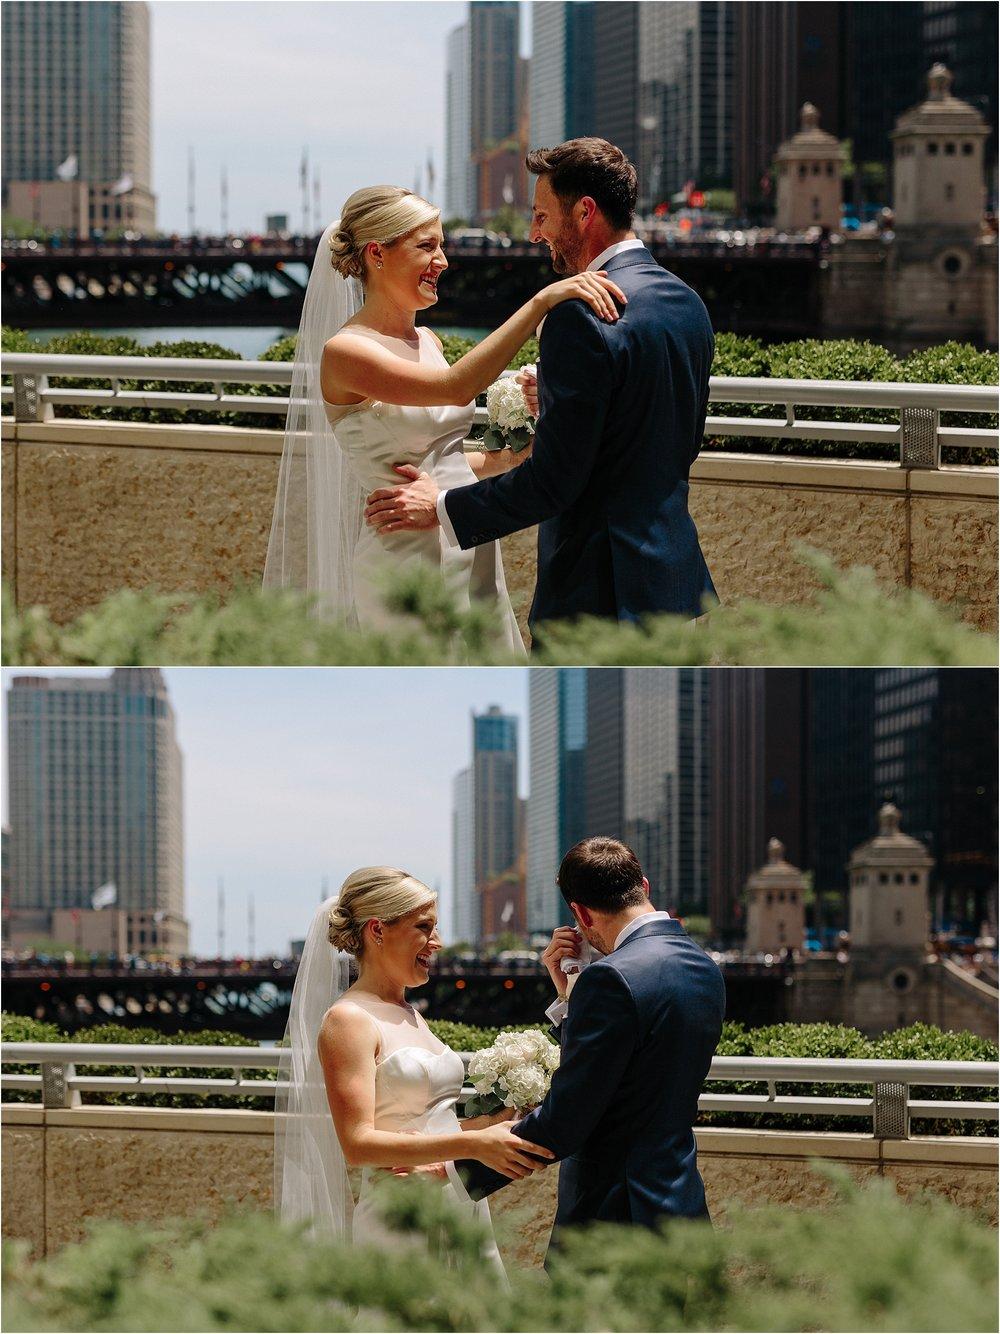 chicago-wedding-photographer-43.jpg